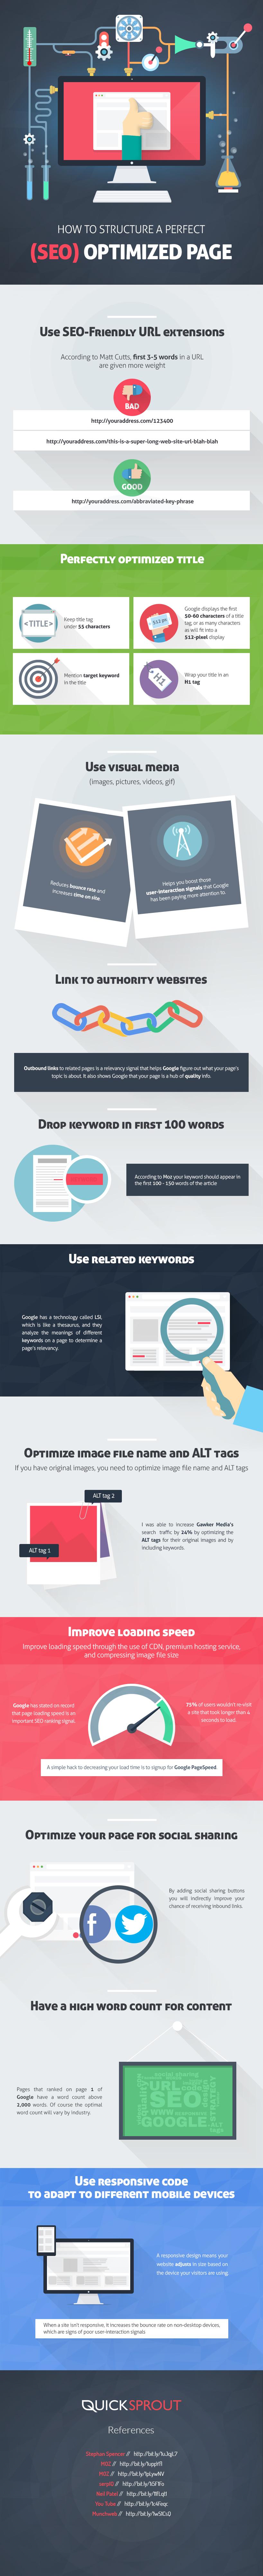 infographie-fondamentaux-seo